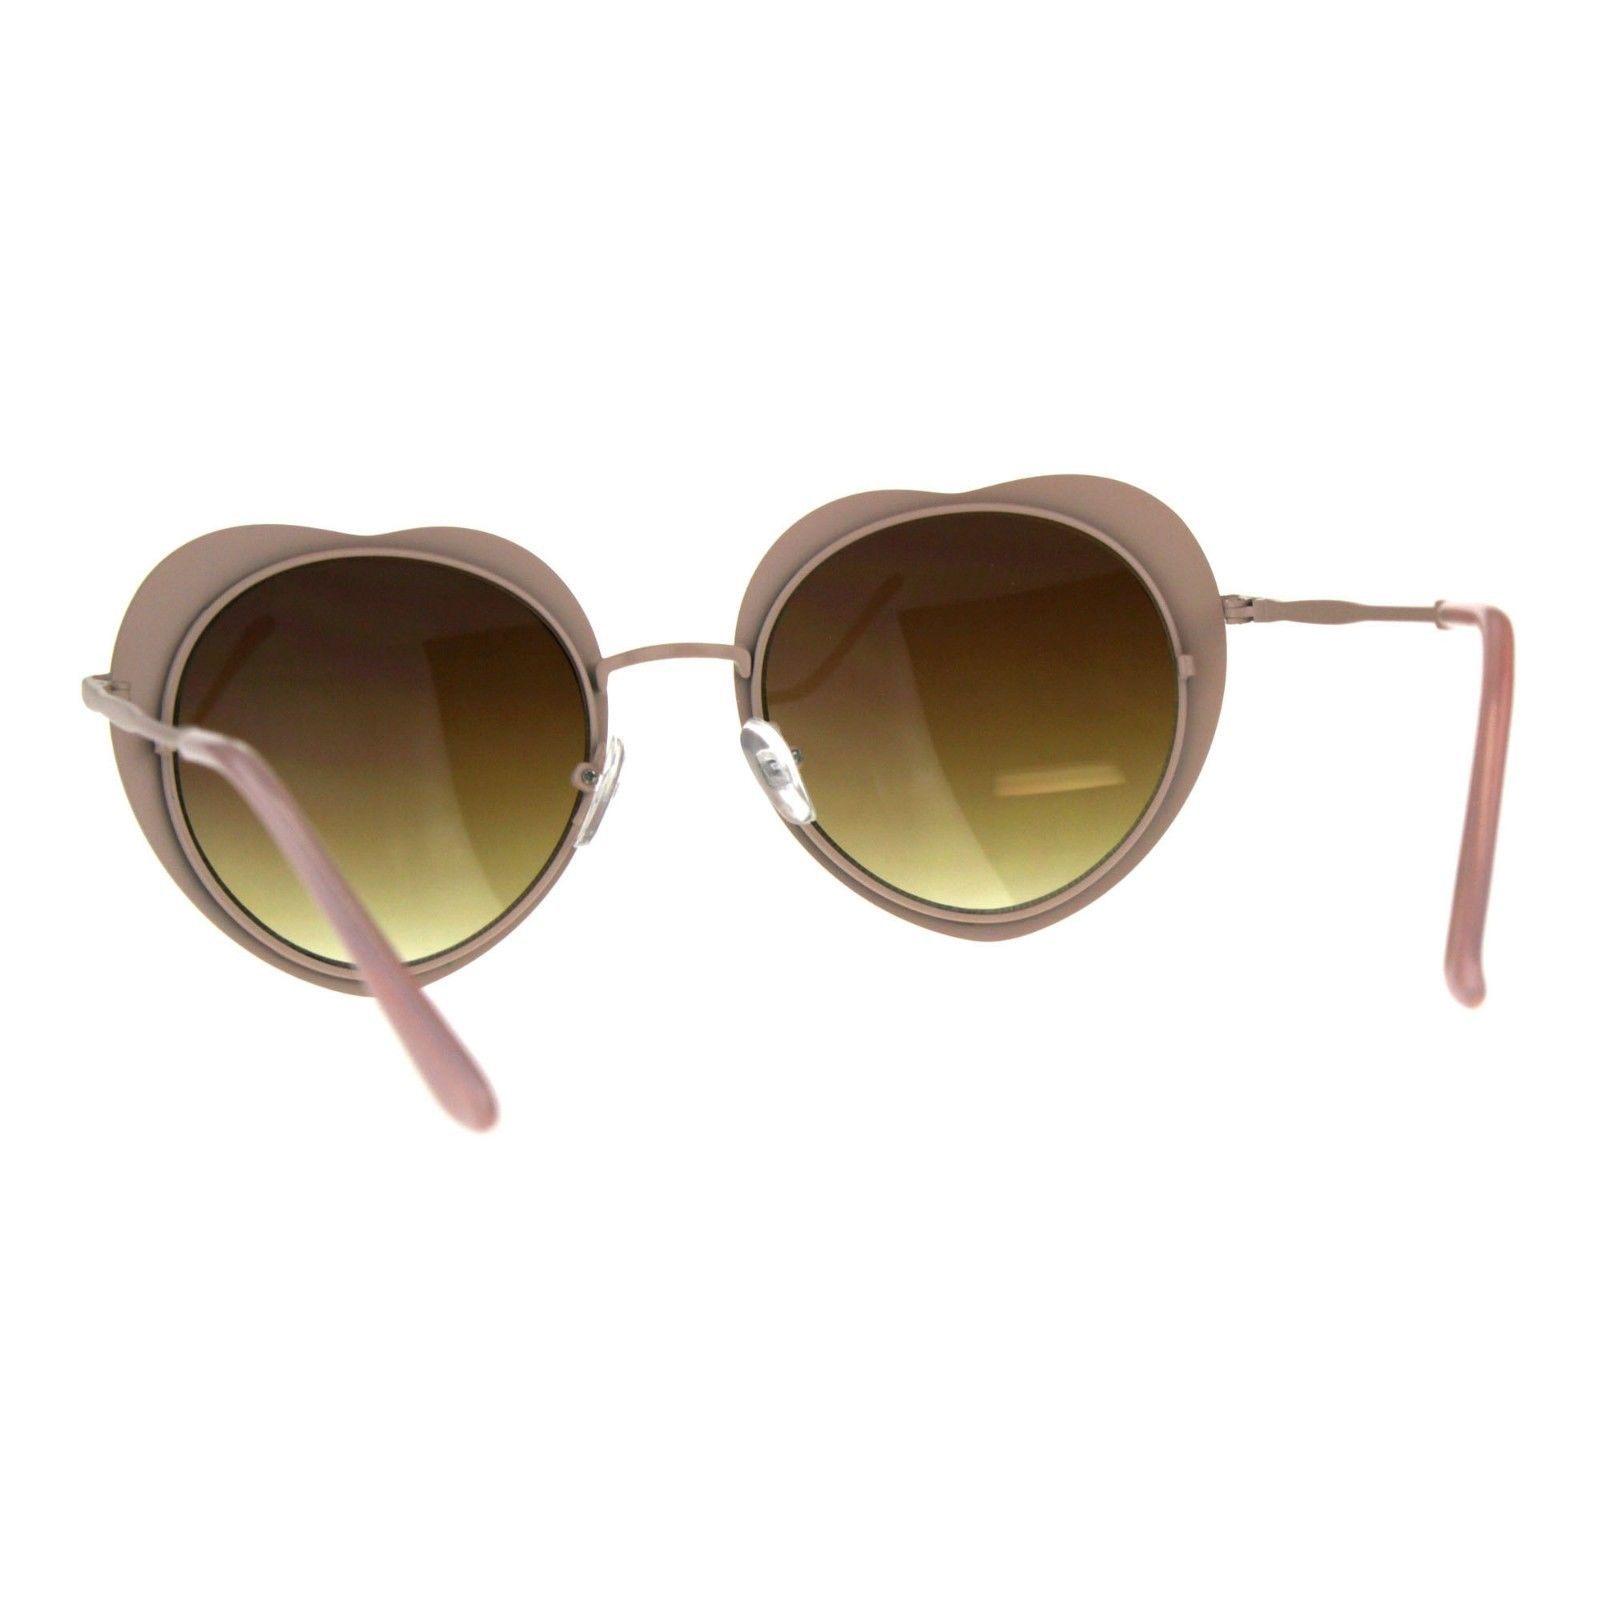 Round Heart Shape Sunglasses Womens Cute Metal Frame Heart Shades